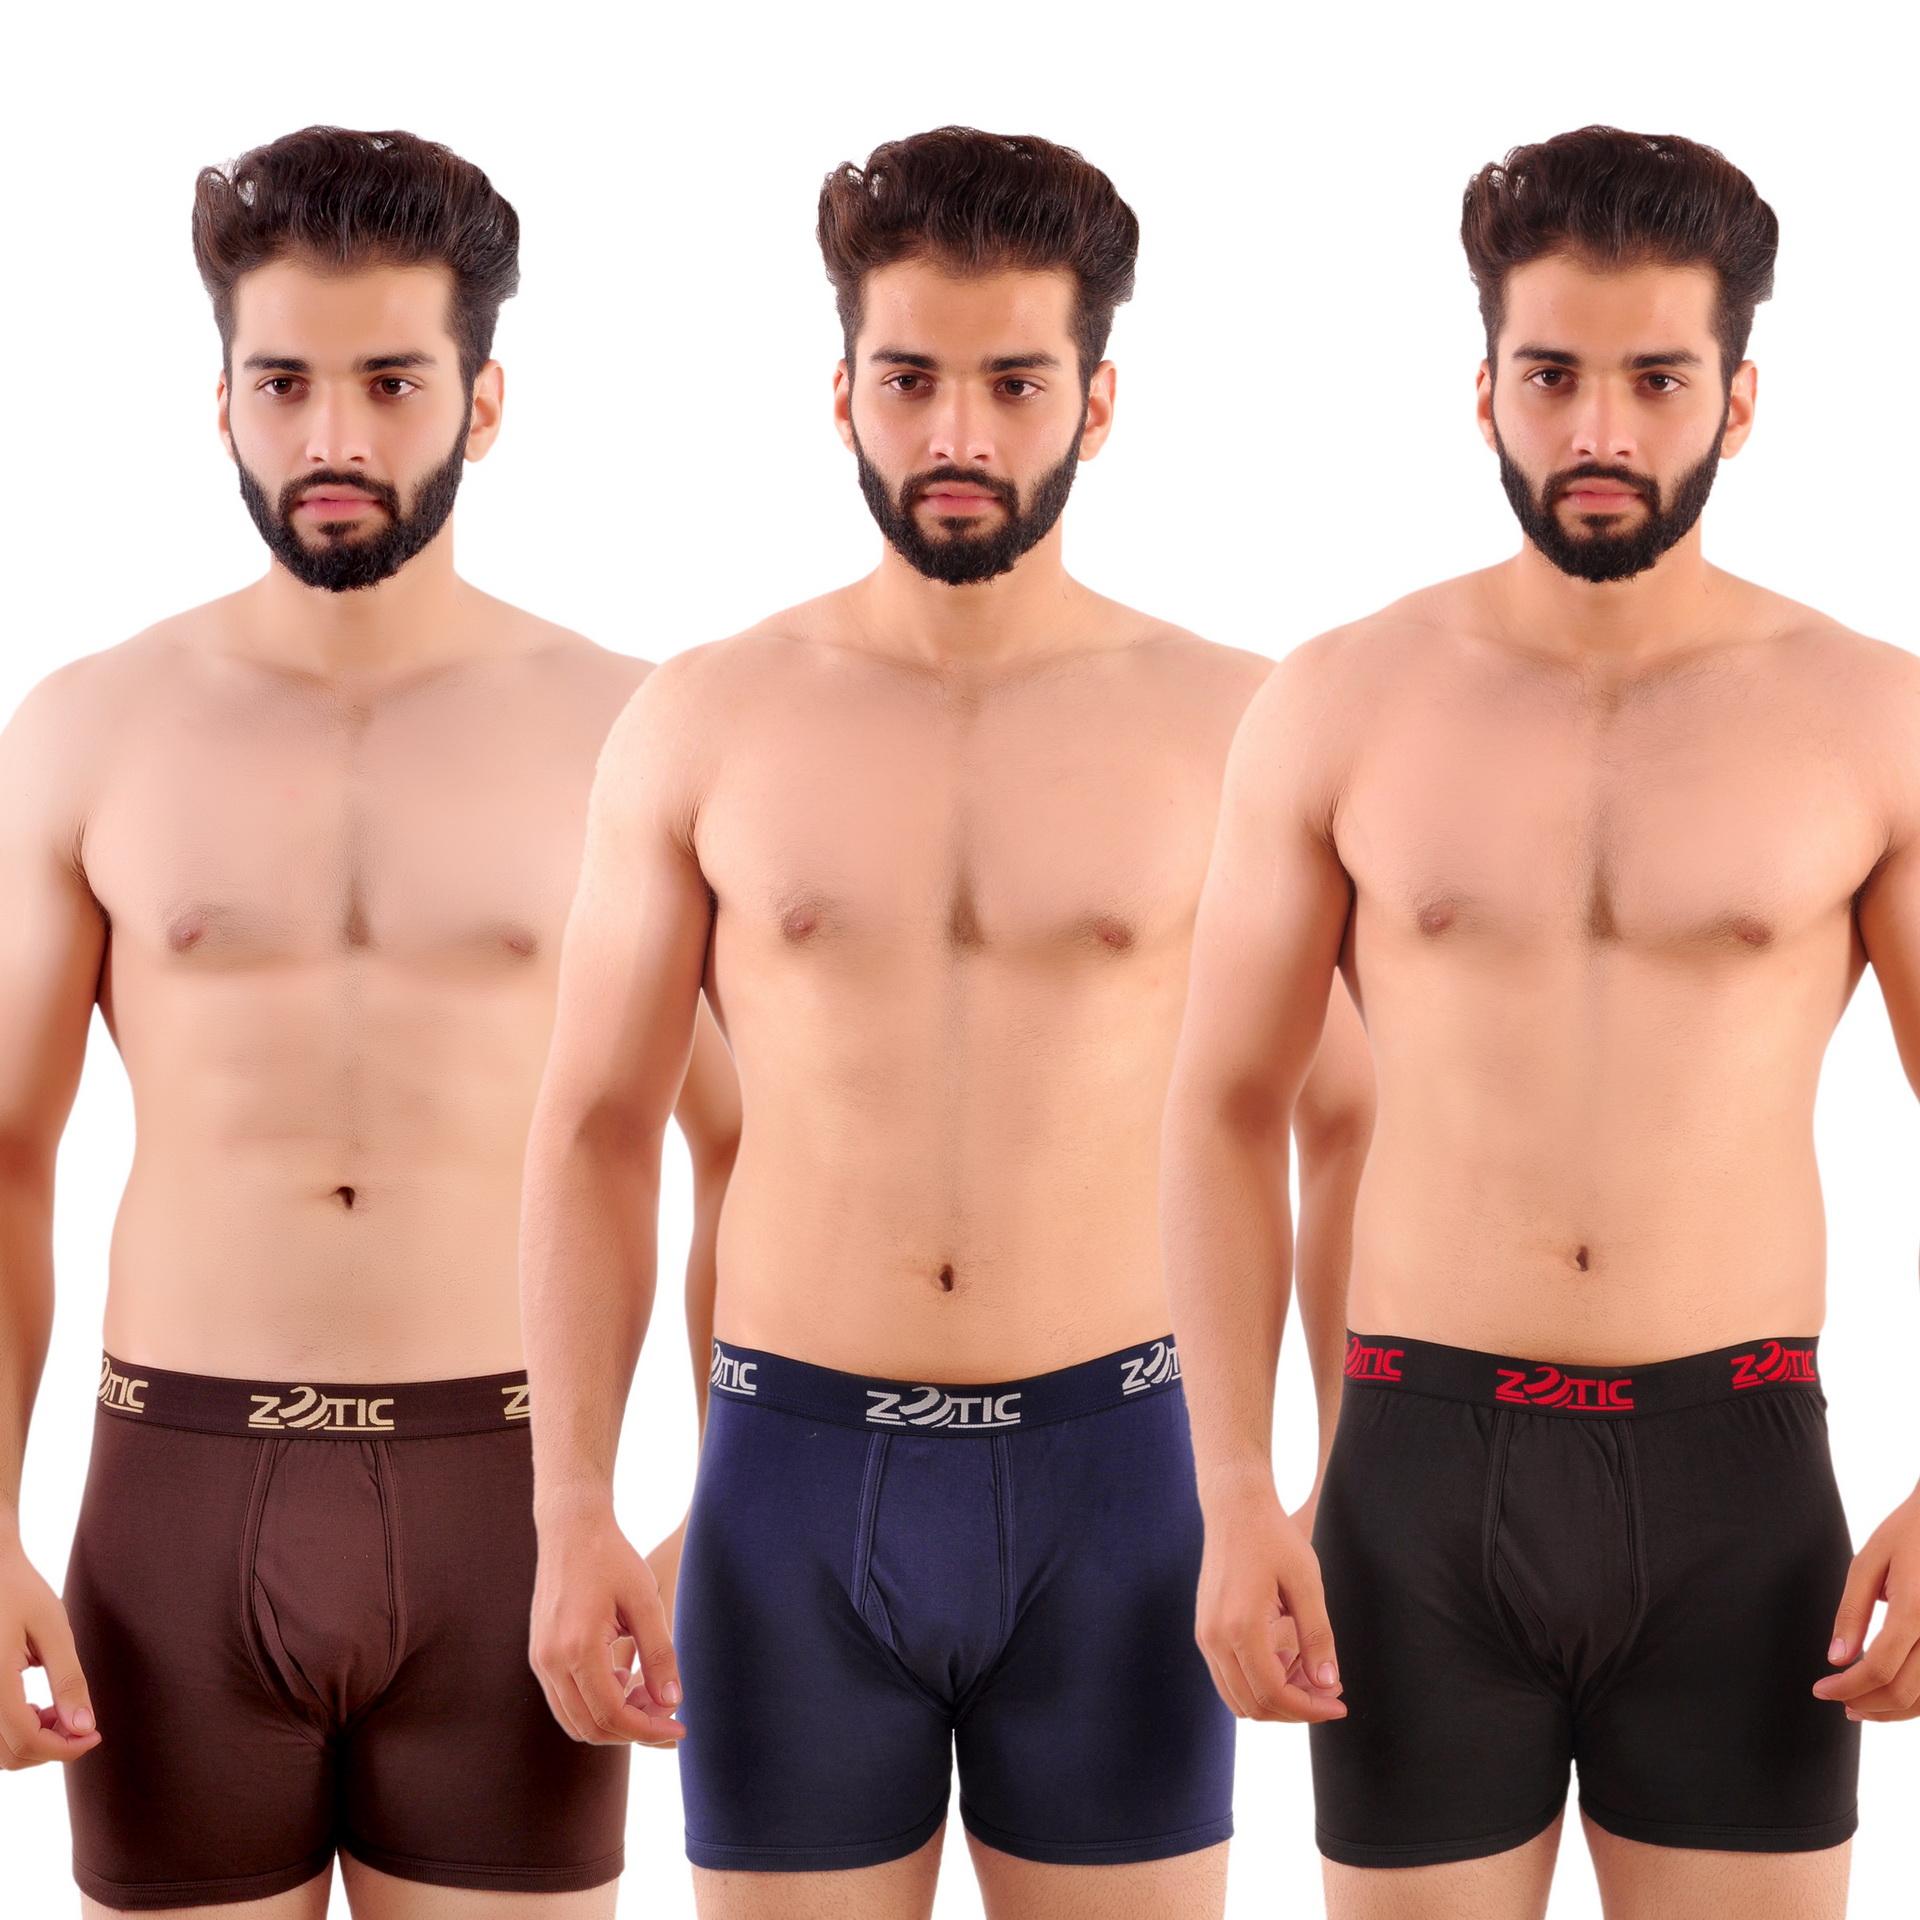 Zotic Men's Trunk'H' Underwear Pack Of 3  Brown,Navy,Red